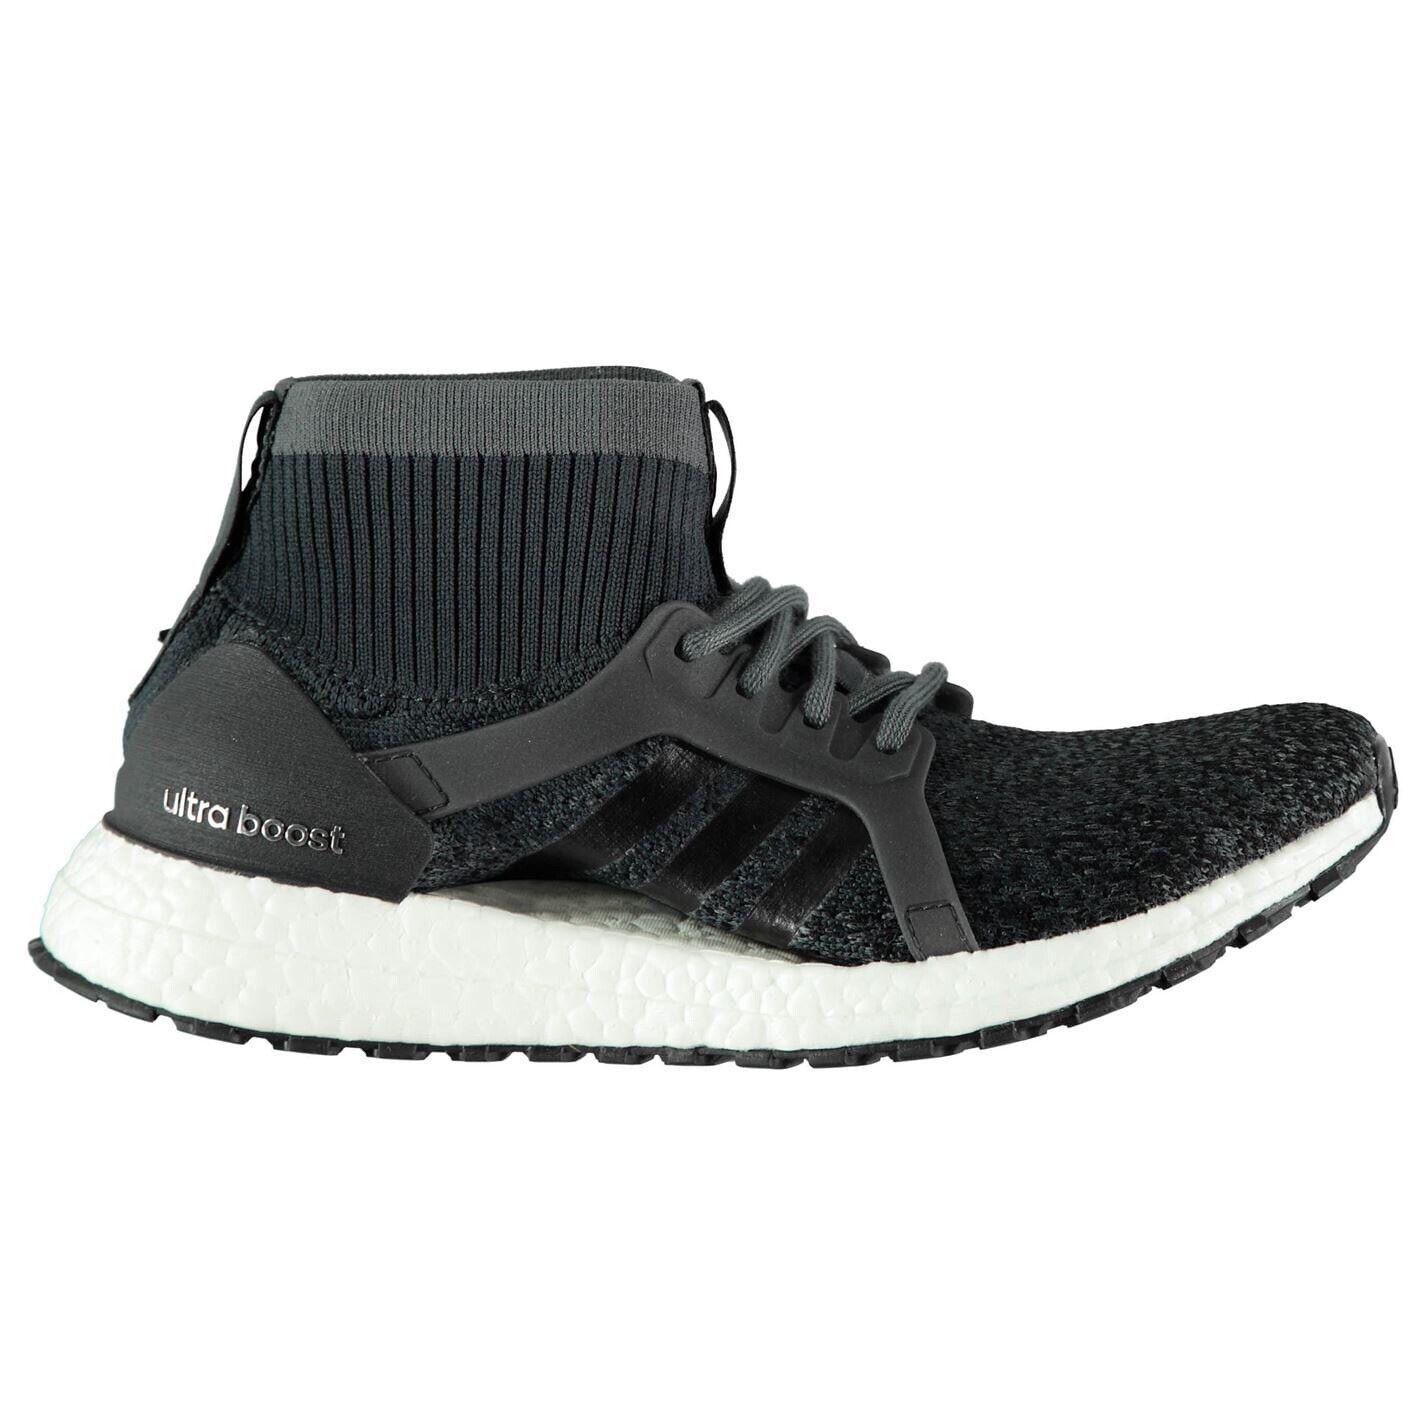 adidas donna's ultra stivali x running scarpe